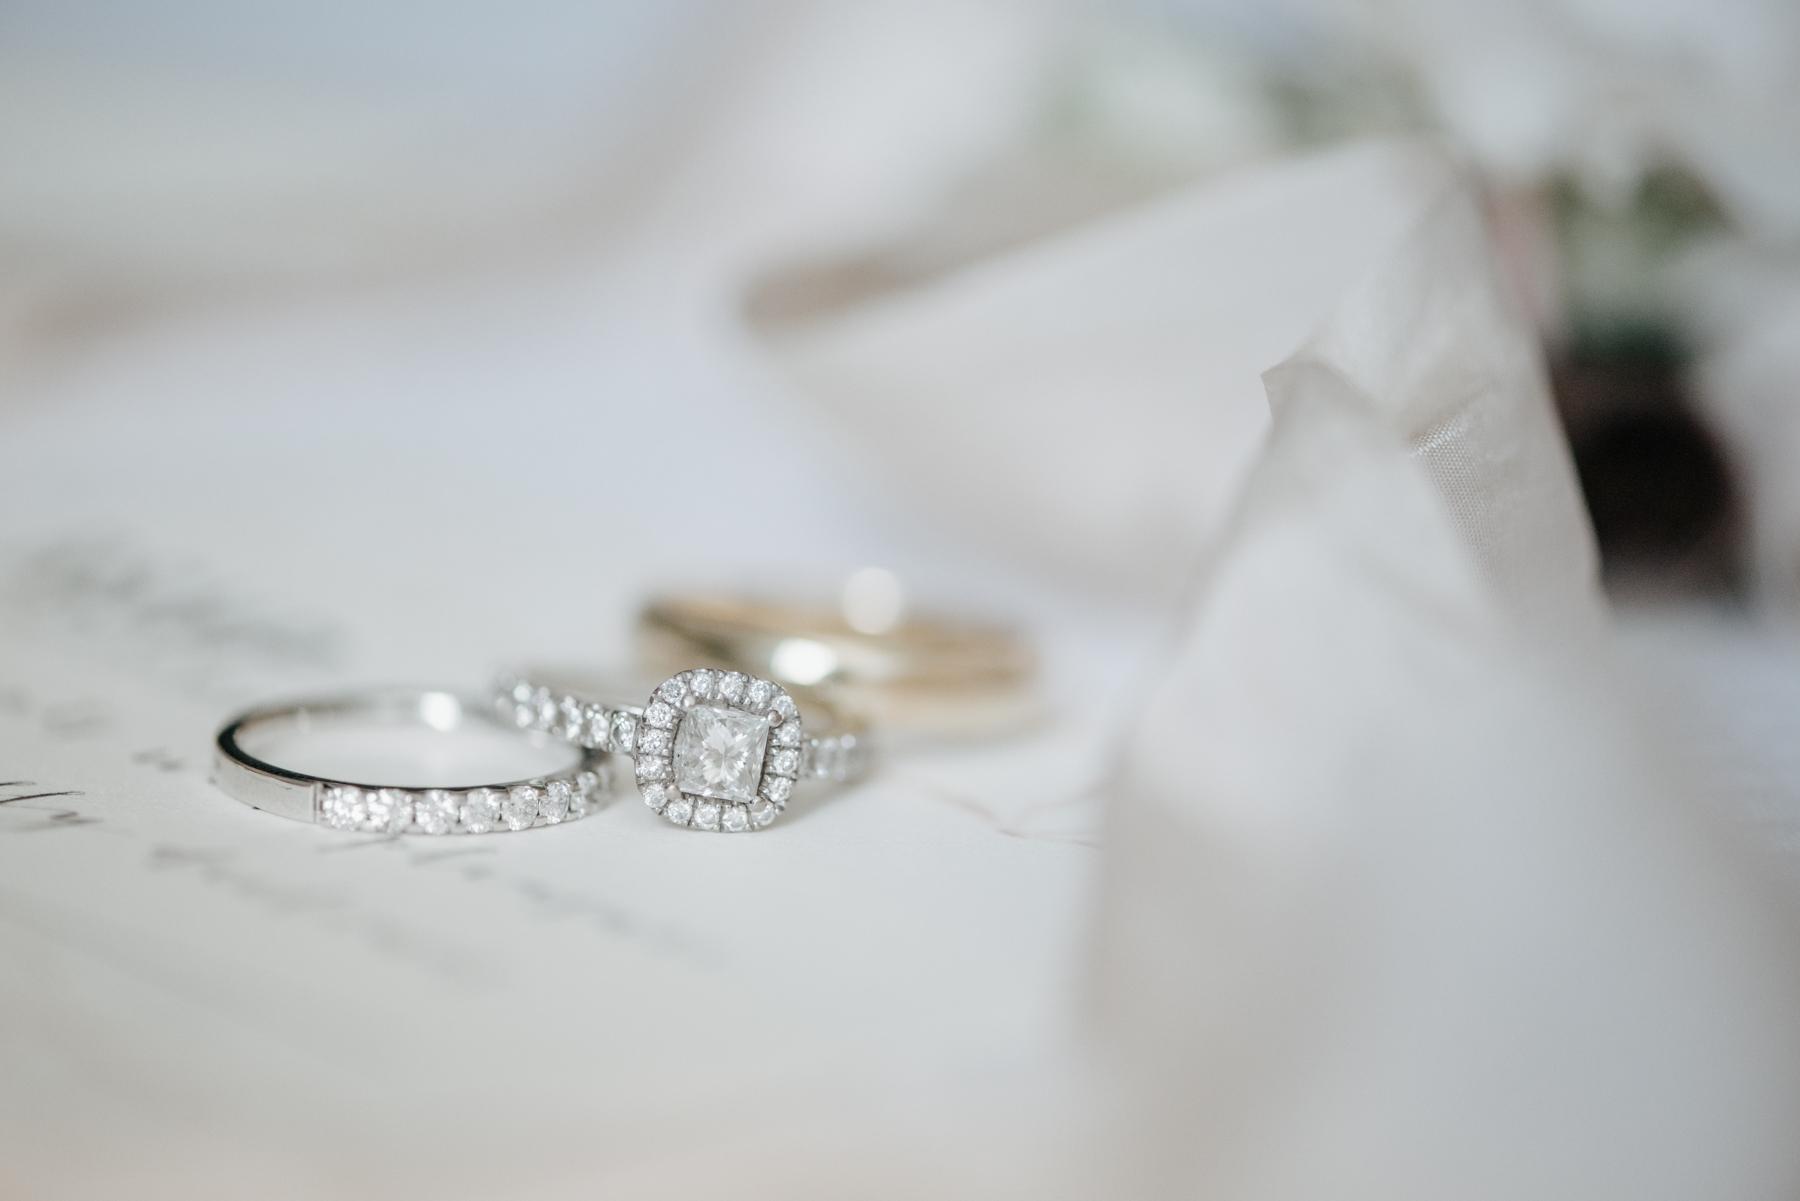 kaoverii_silva_photographer_cynthia_richard_wedding_vancouver_brix_&_mortar-3.jpg